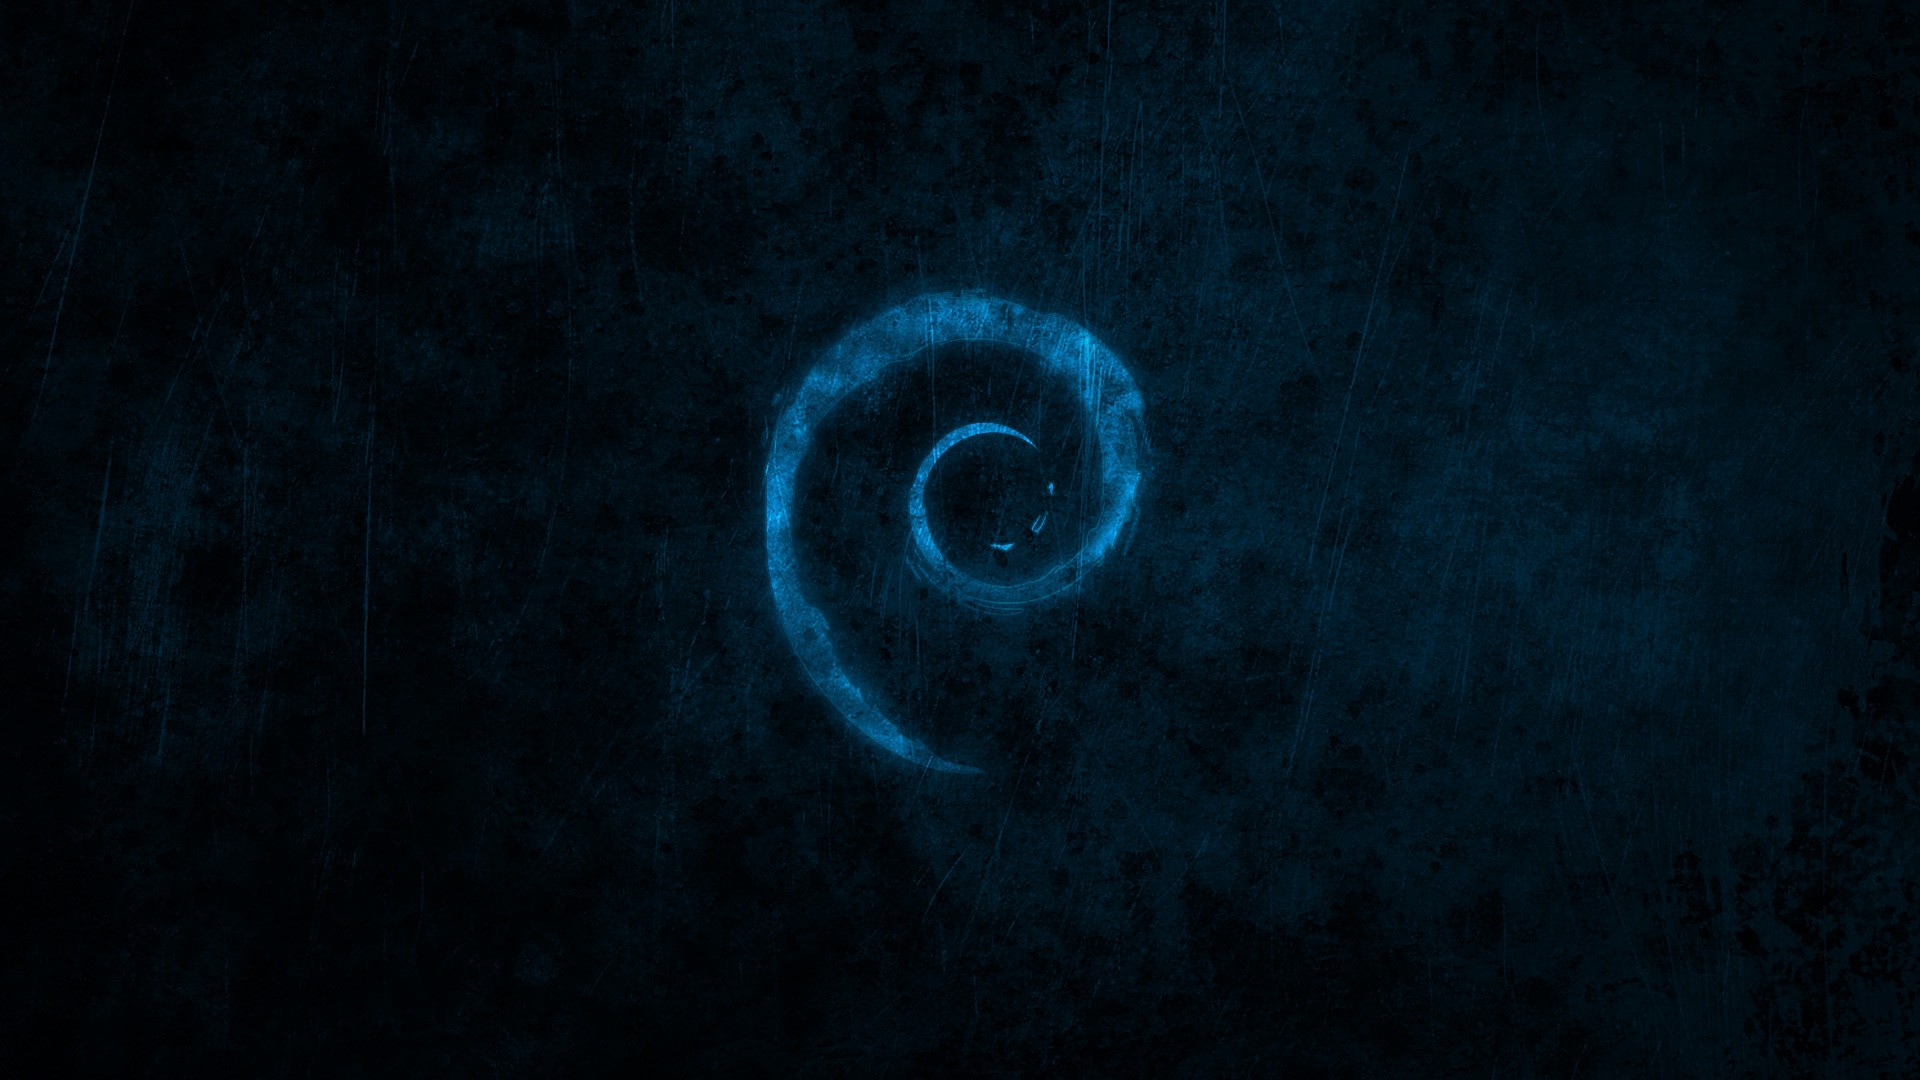 Download wallpaper 1920x1080 linux debian brand logo spiral hd 1920x1080